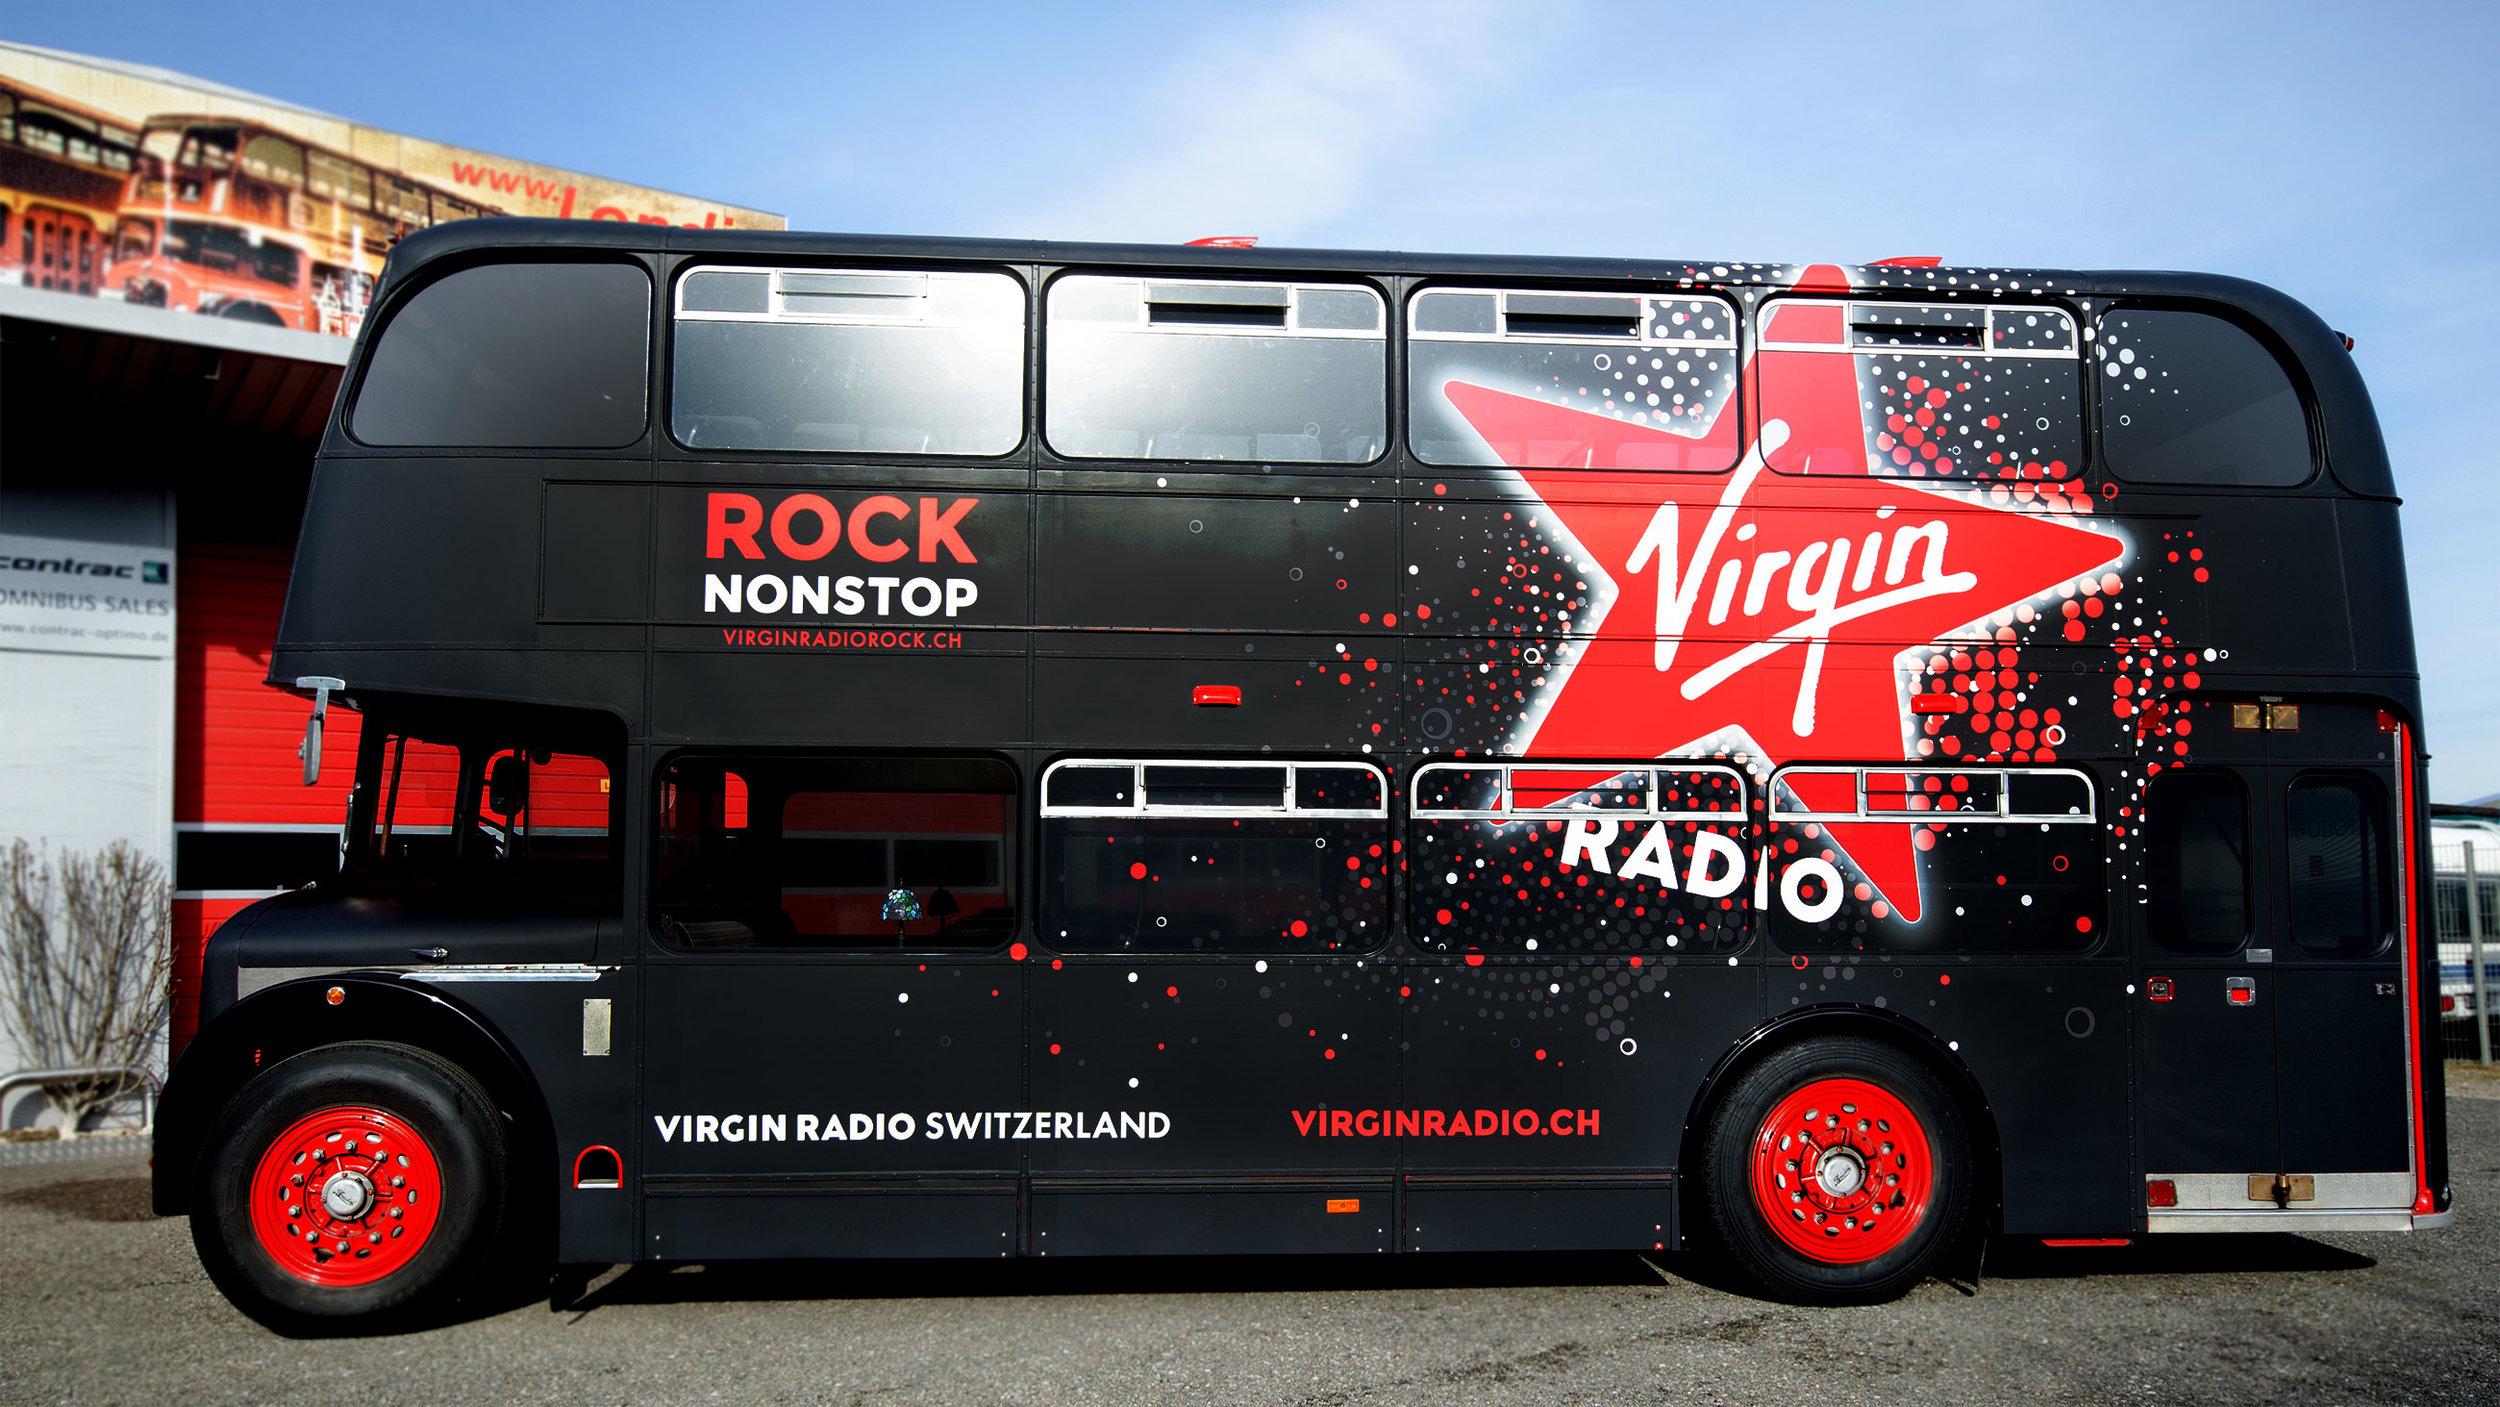 Promotionen Virgin Radio Switzerland